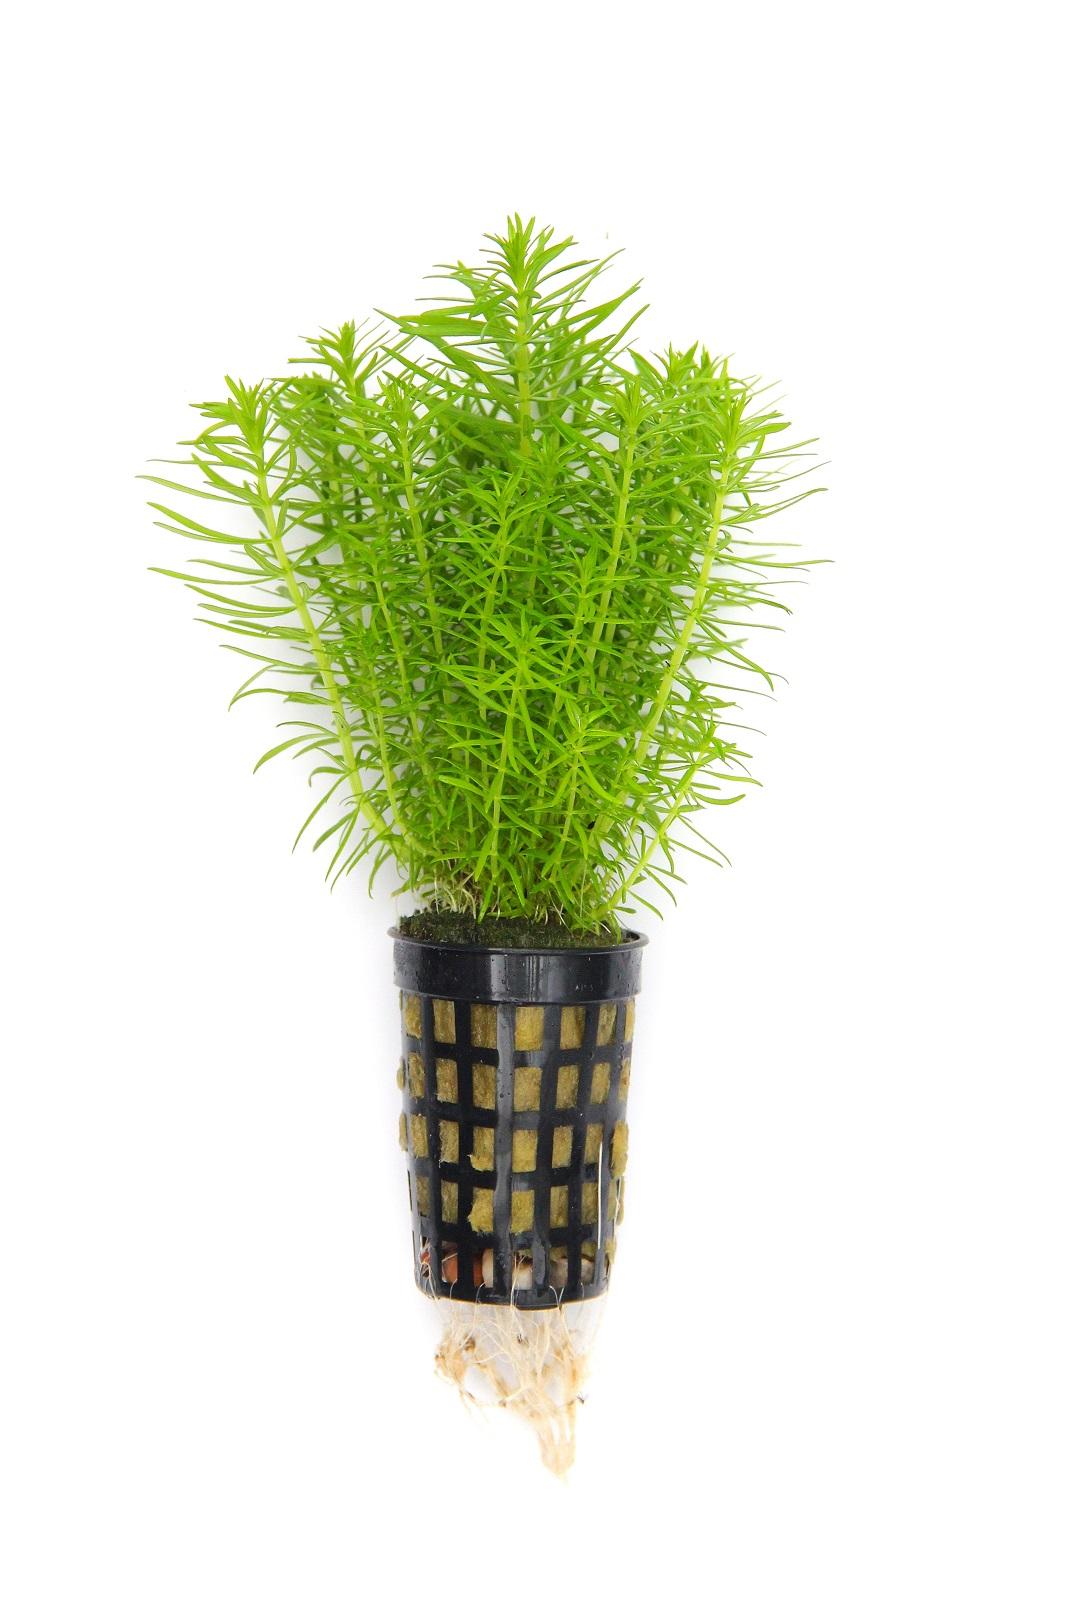 Pogostemon erectus Indische Sternpflanze 1 Topf Ø 5cm